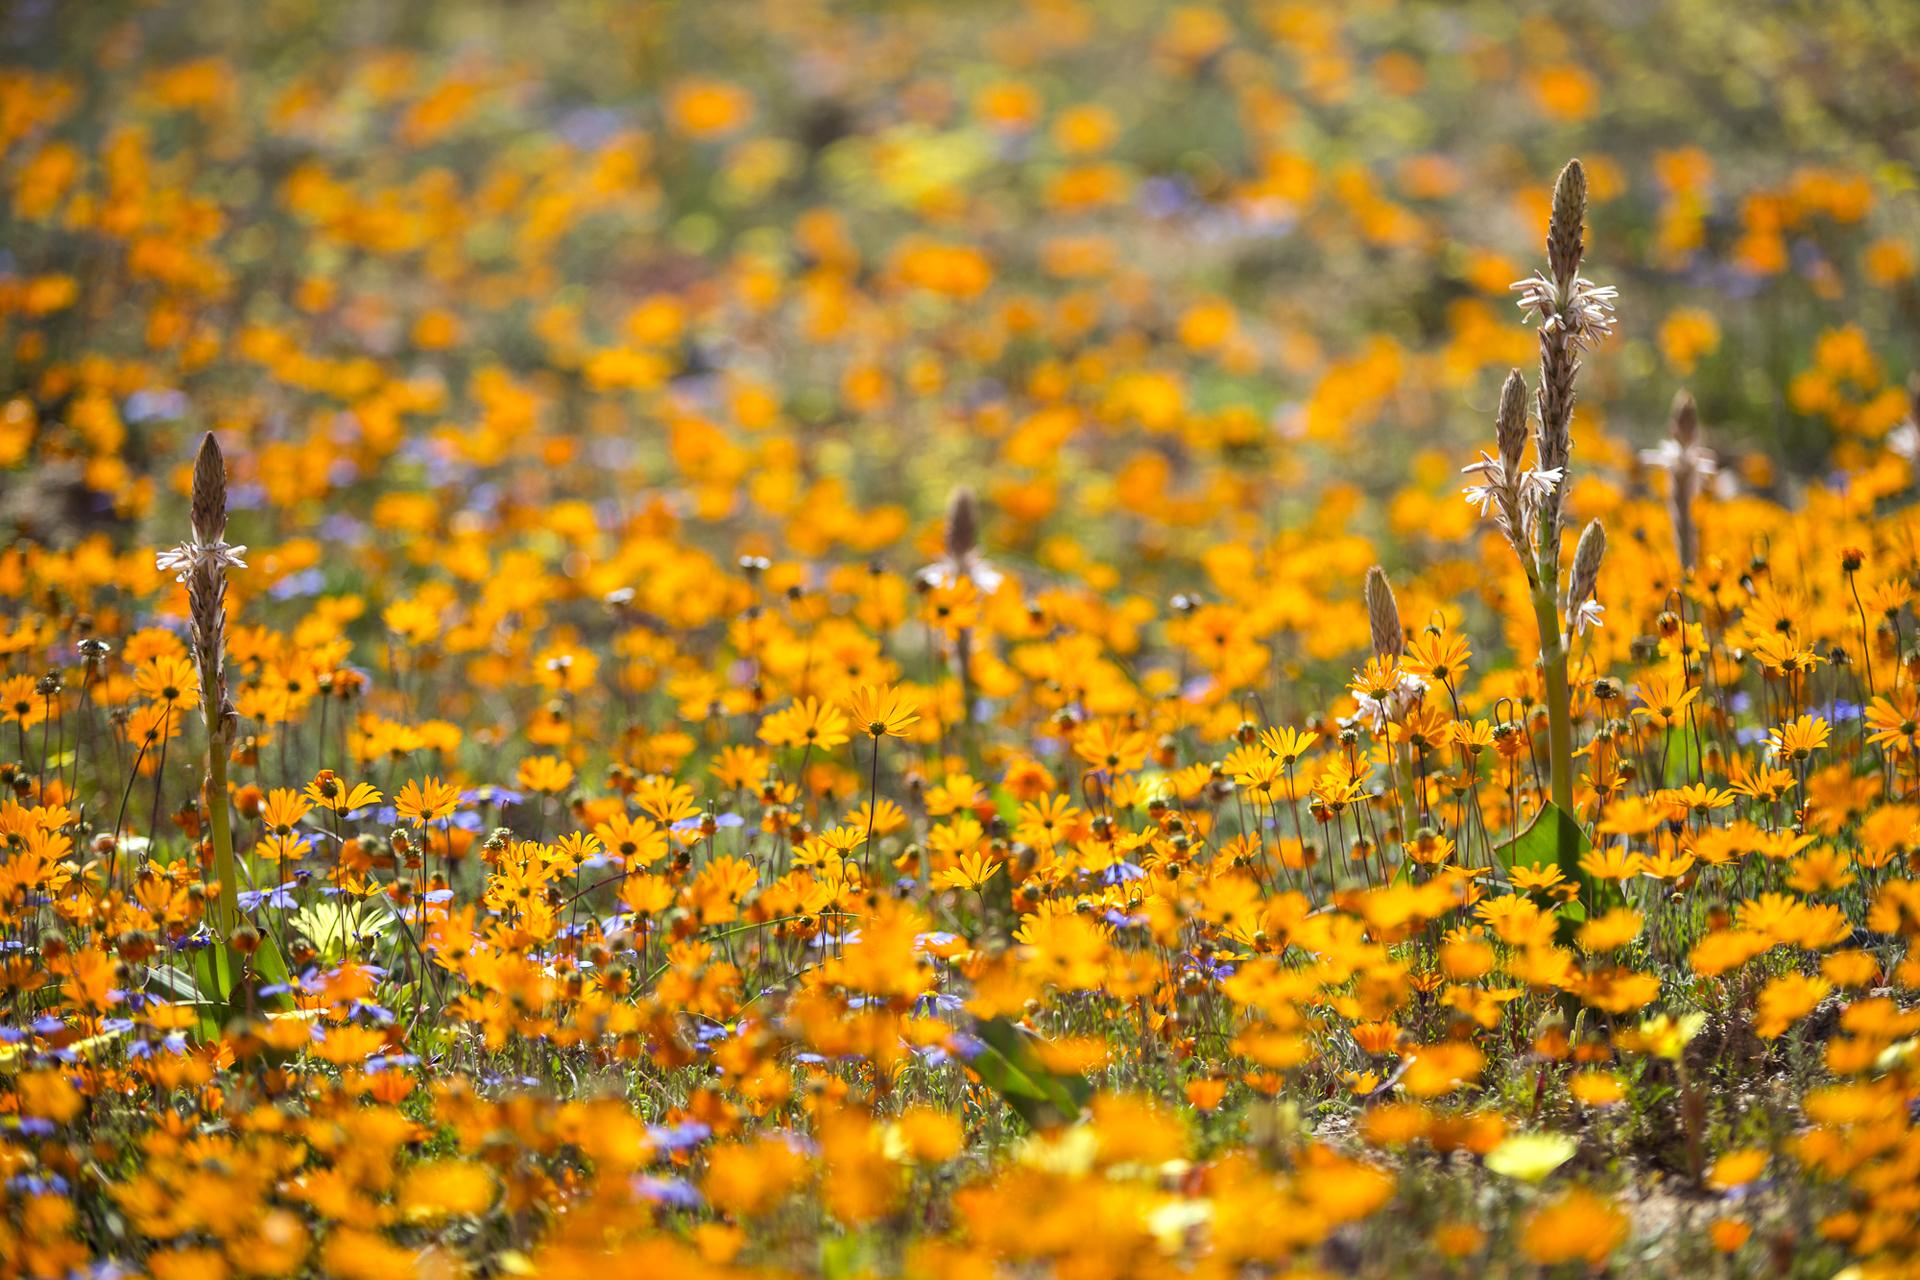 SouthAfrica_025.jpg